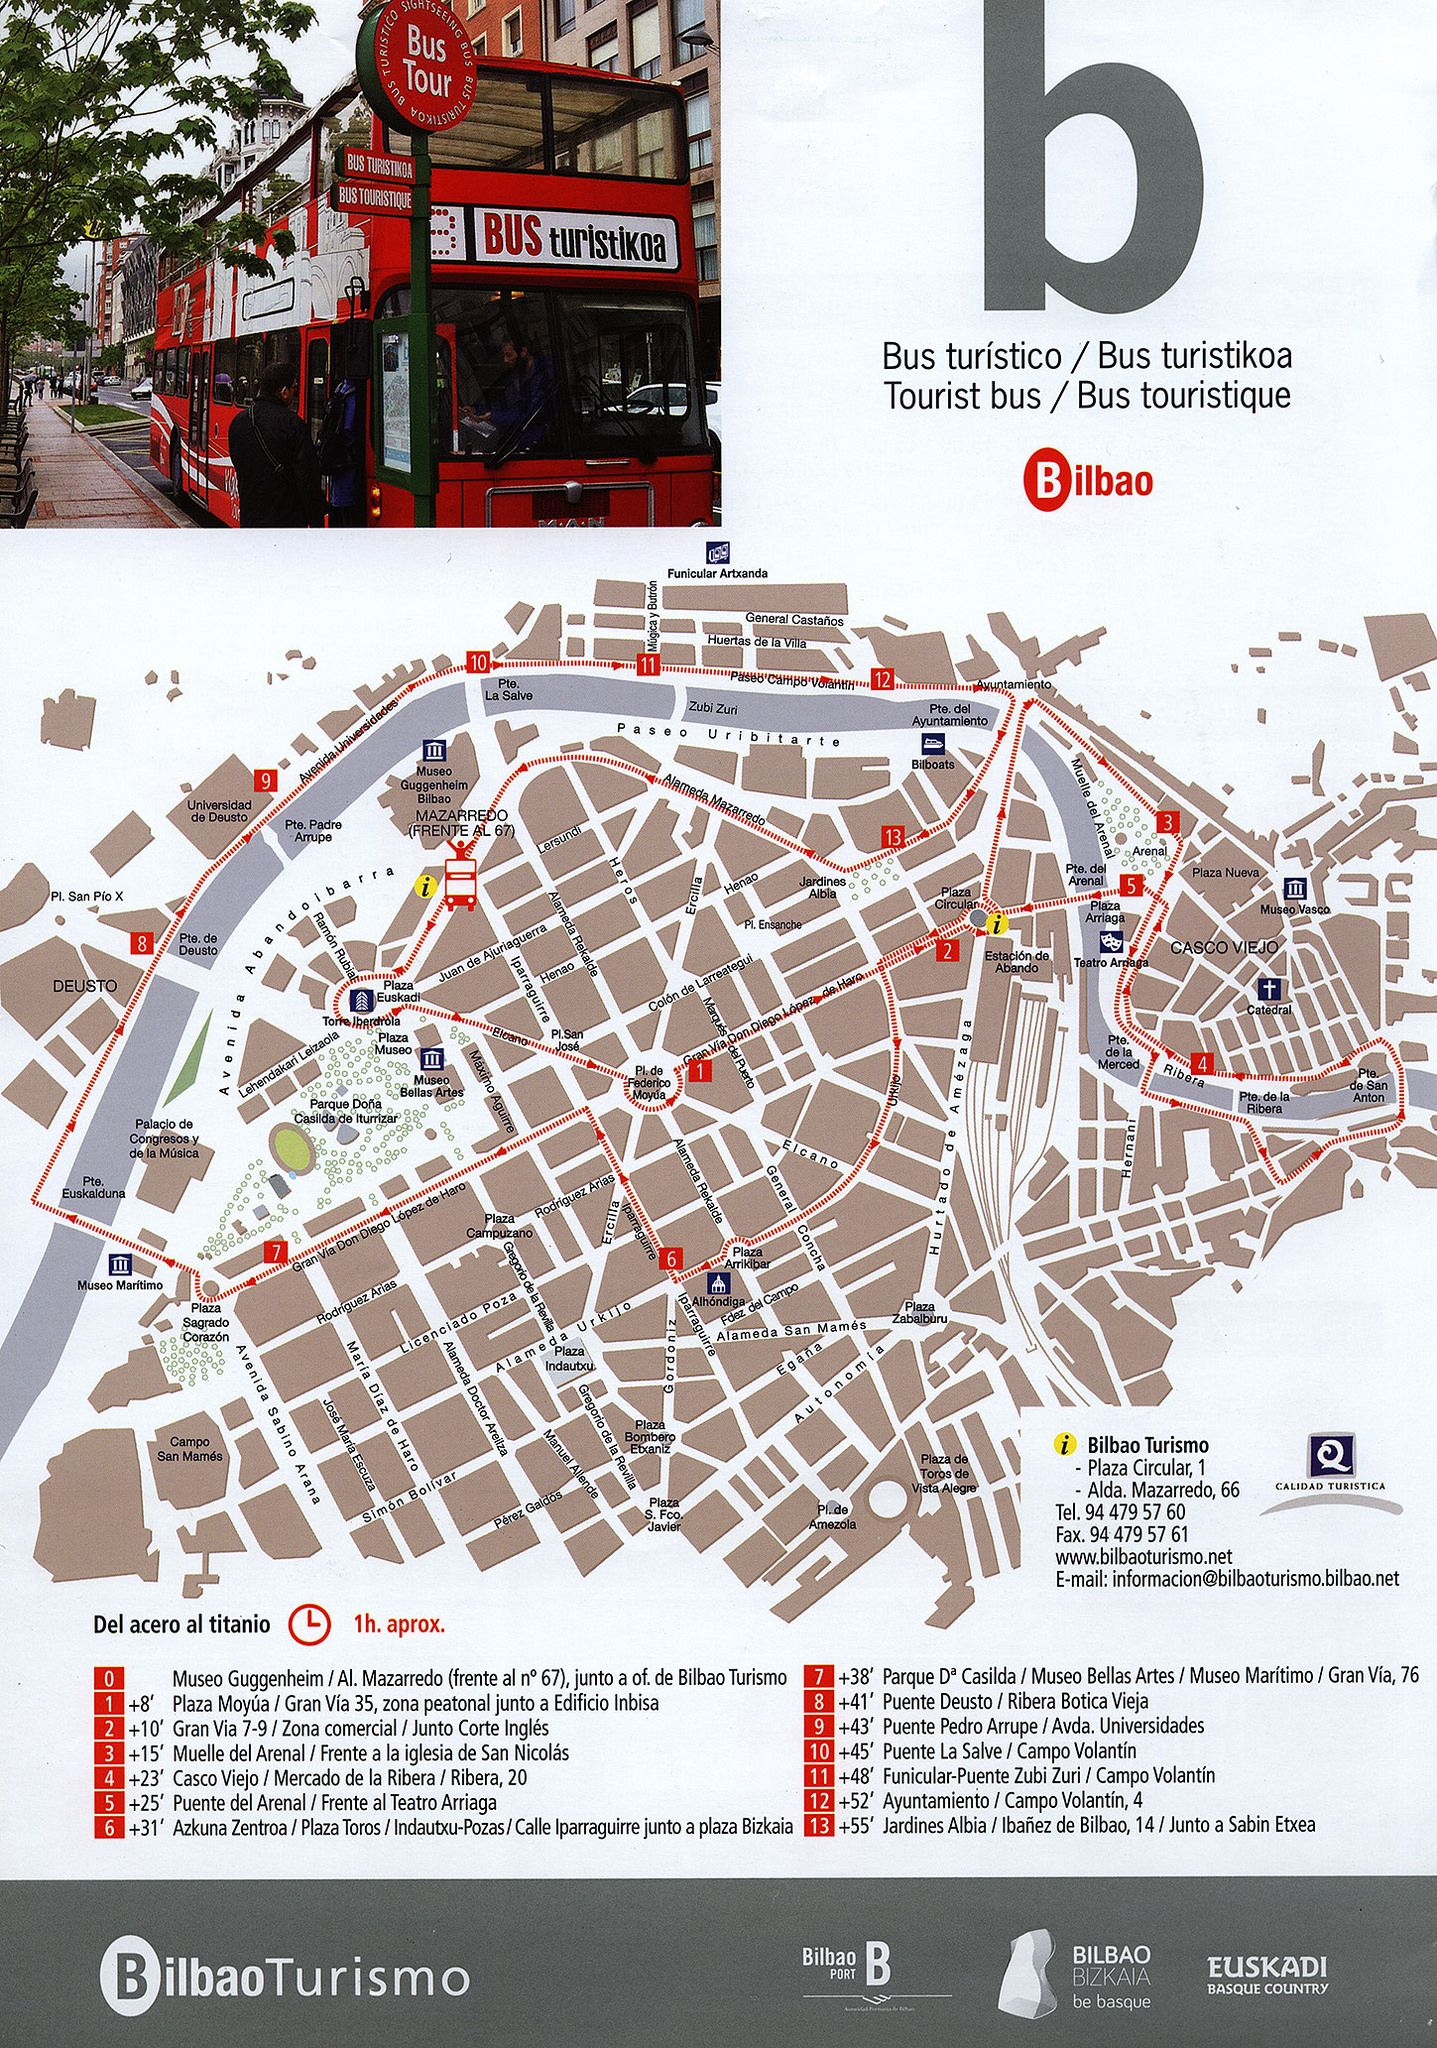 Bilbao Turismo Bus Turistico Bus Turistikoa Tourist Bus Bus